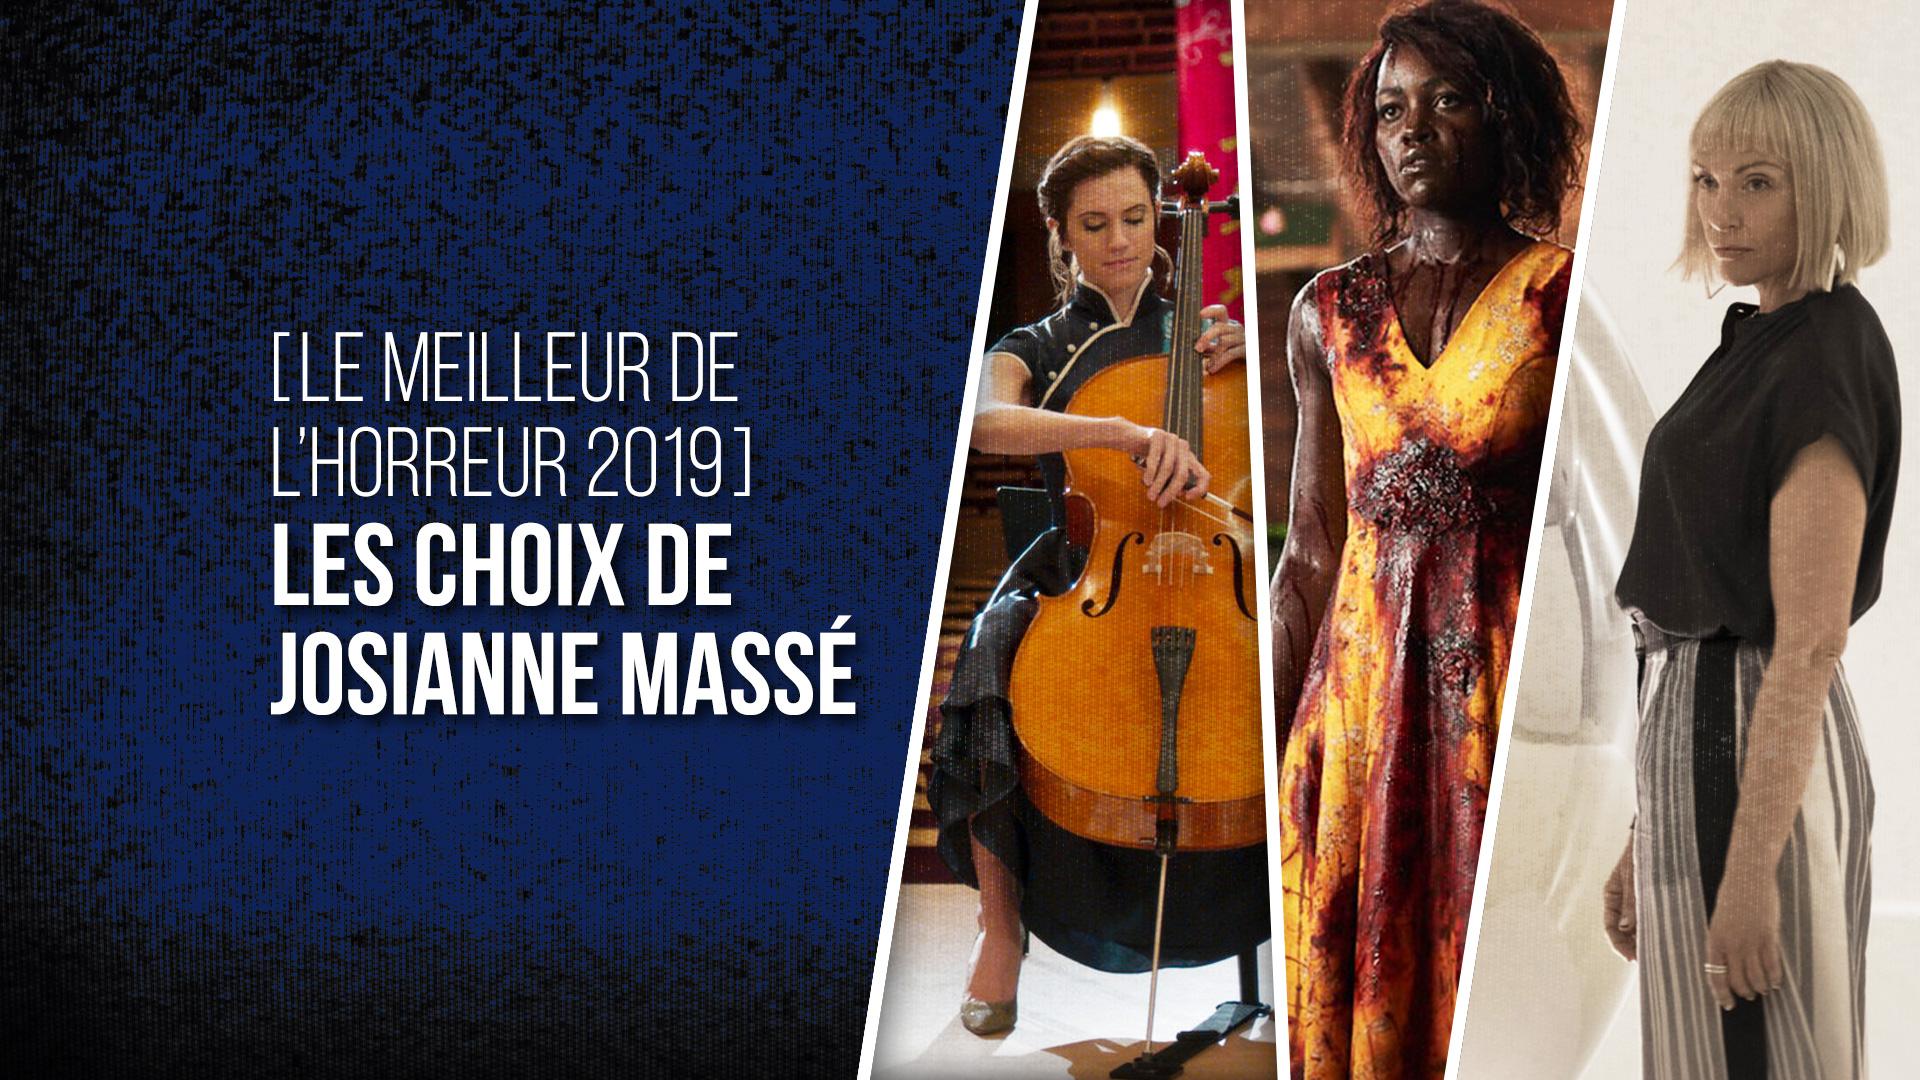 Choix Josianne Massé 2019